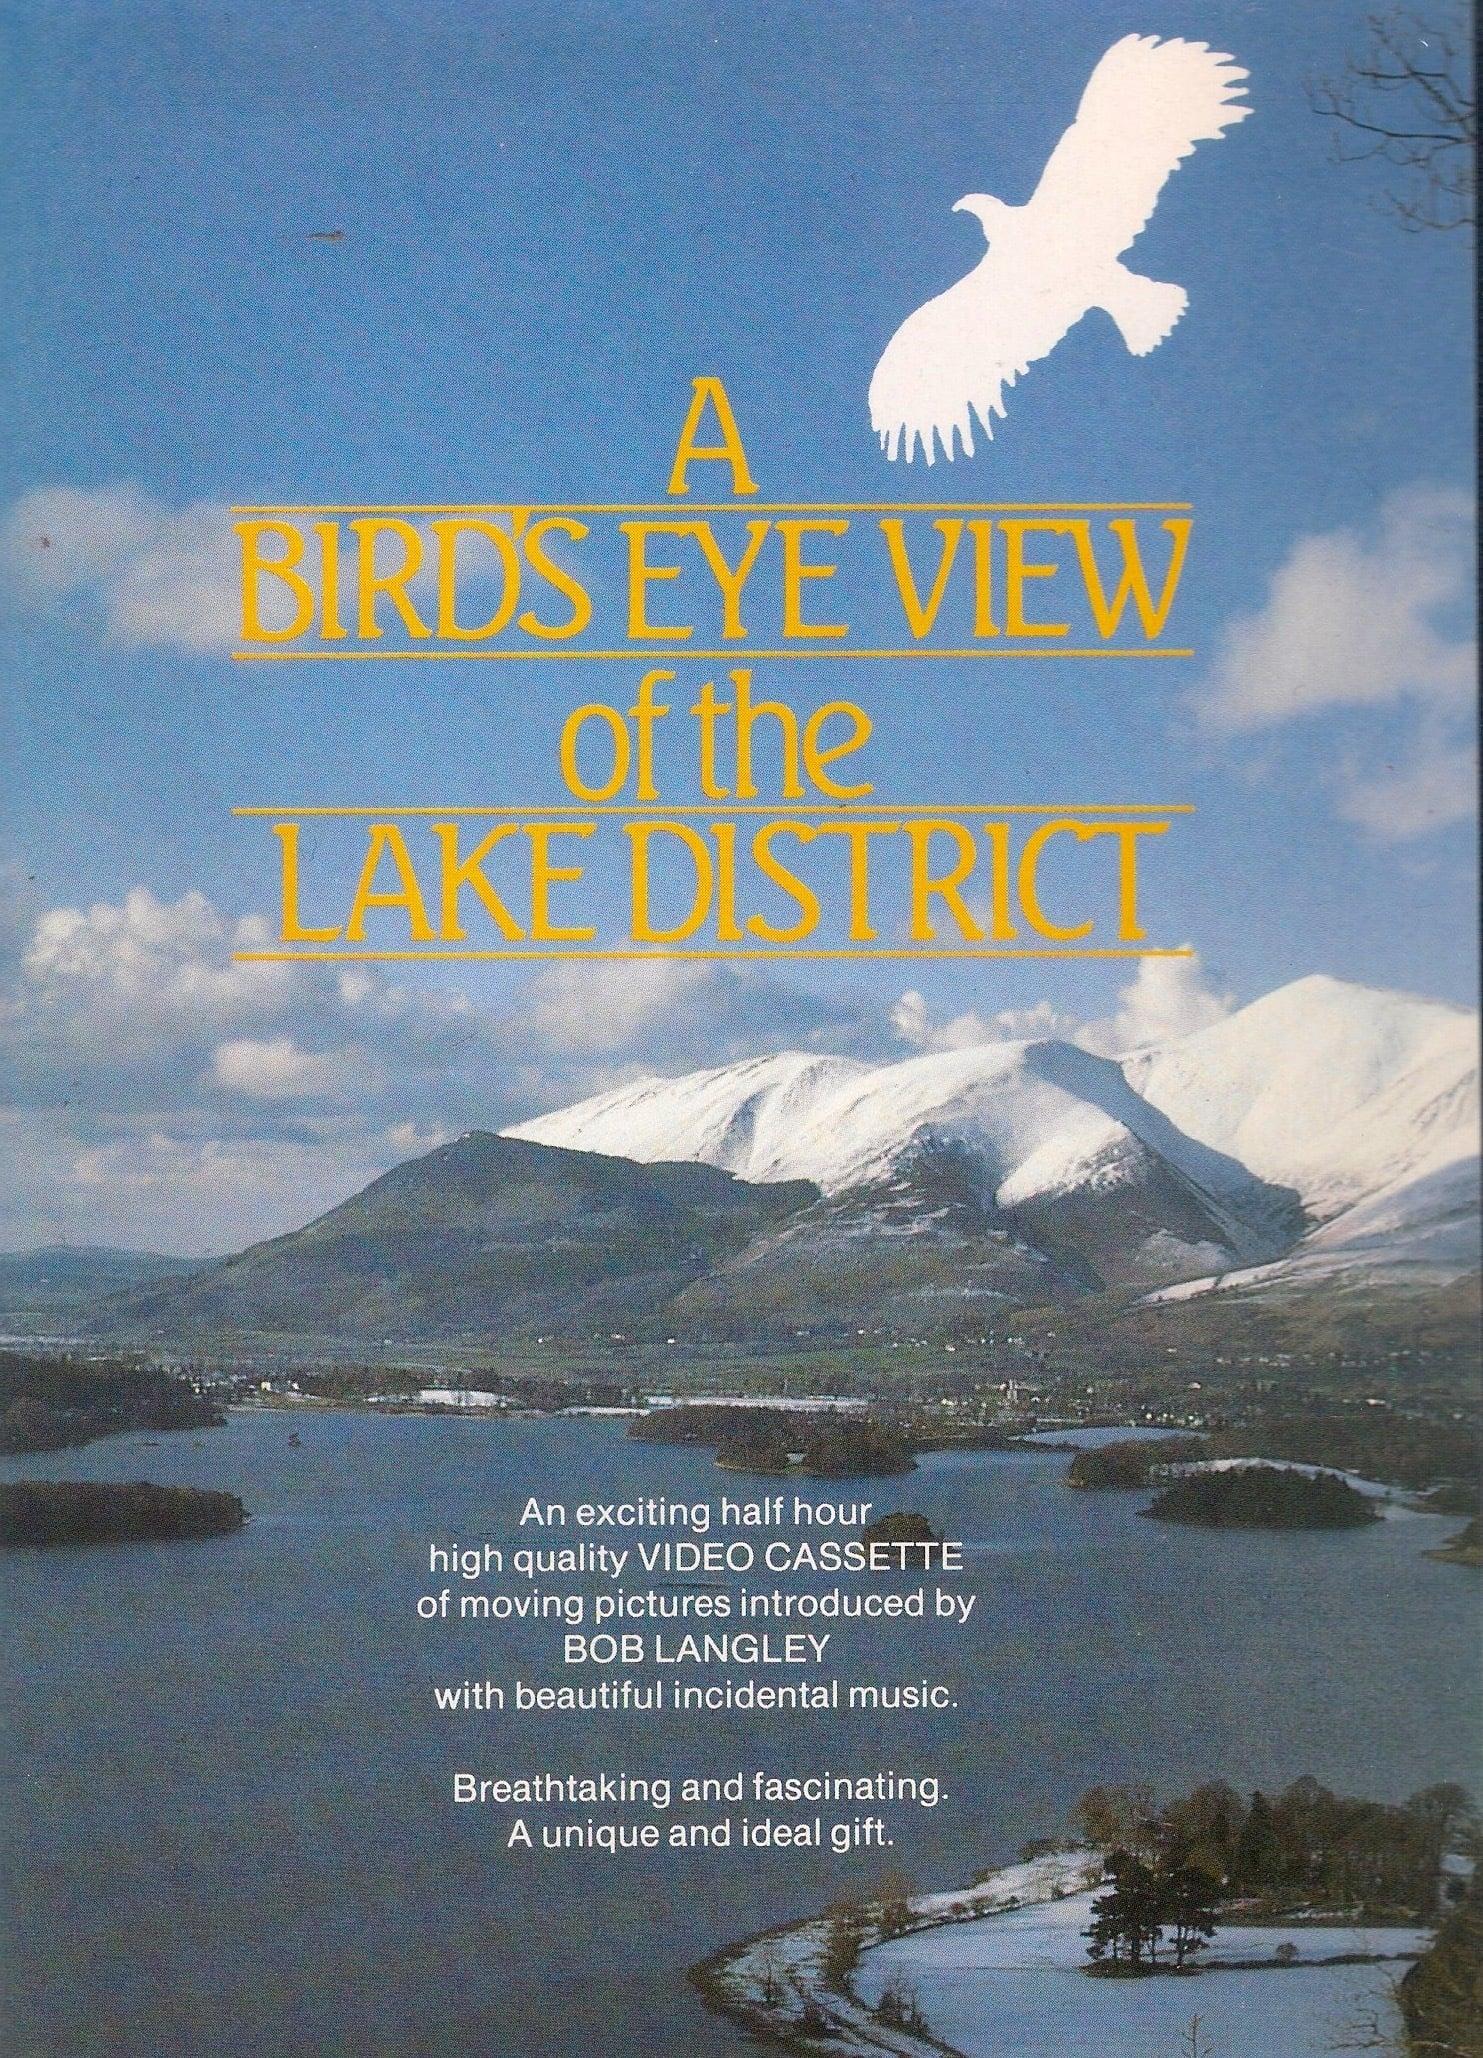 A Bird's Eye View Of The Lake District